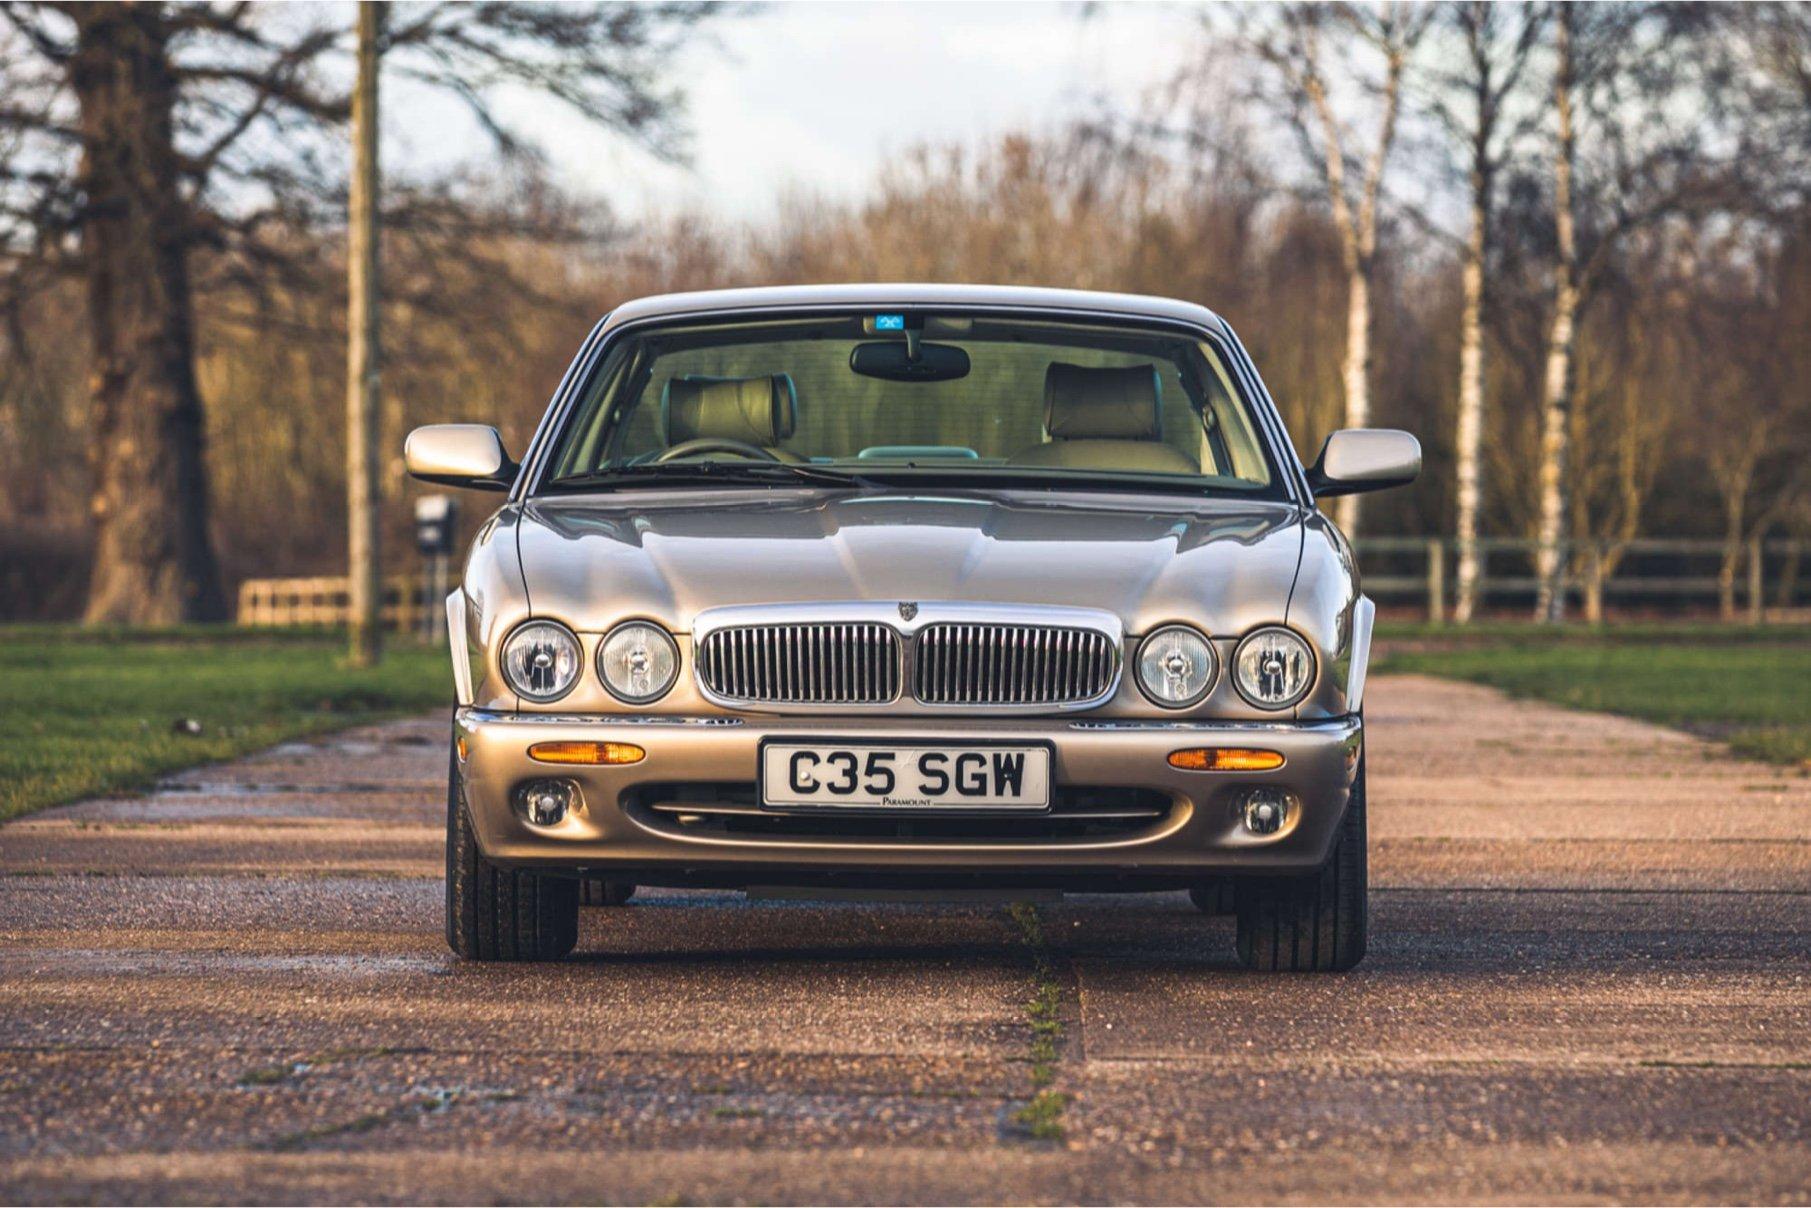 1998 Jaguar XJ Sovereign - £10,125 - Silverstone Auction mars 2021.